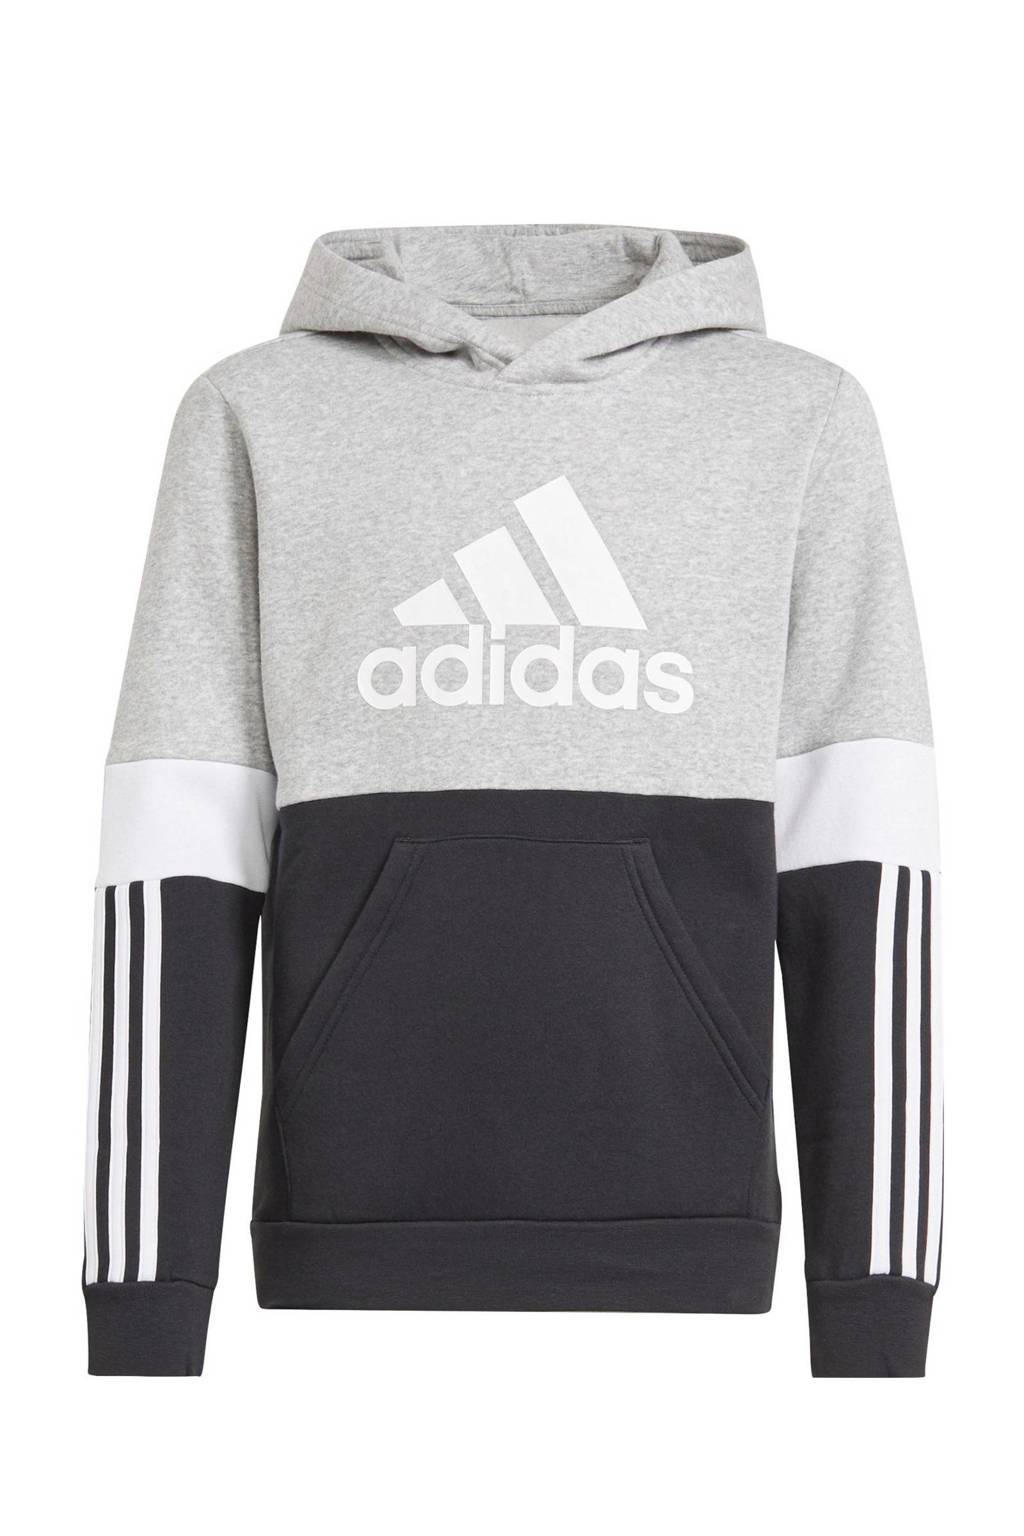 adidas Performance   fleece sportsweater zwart/grijs melange/wit, Zwart/grijs melange/wit